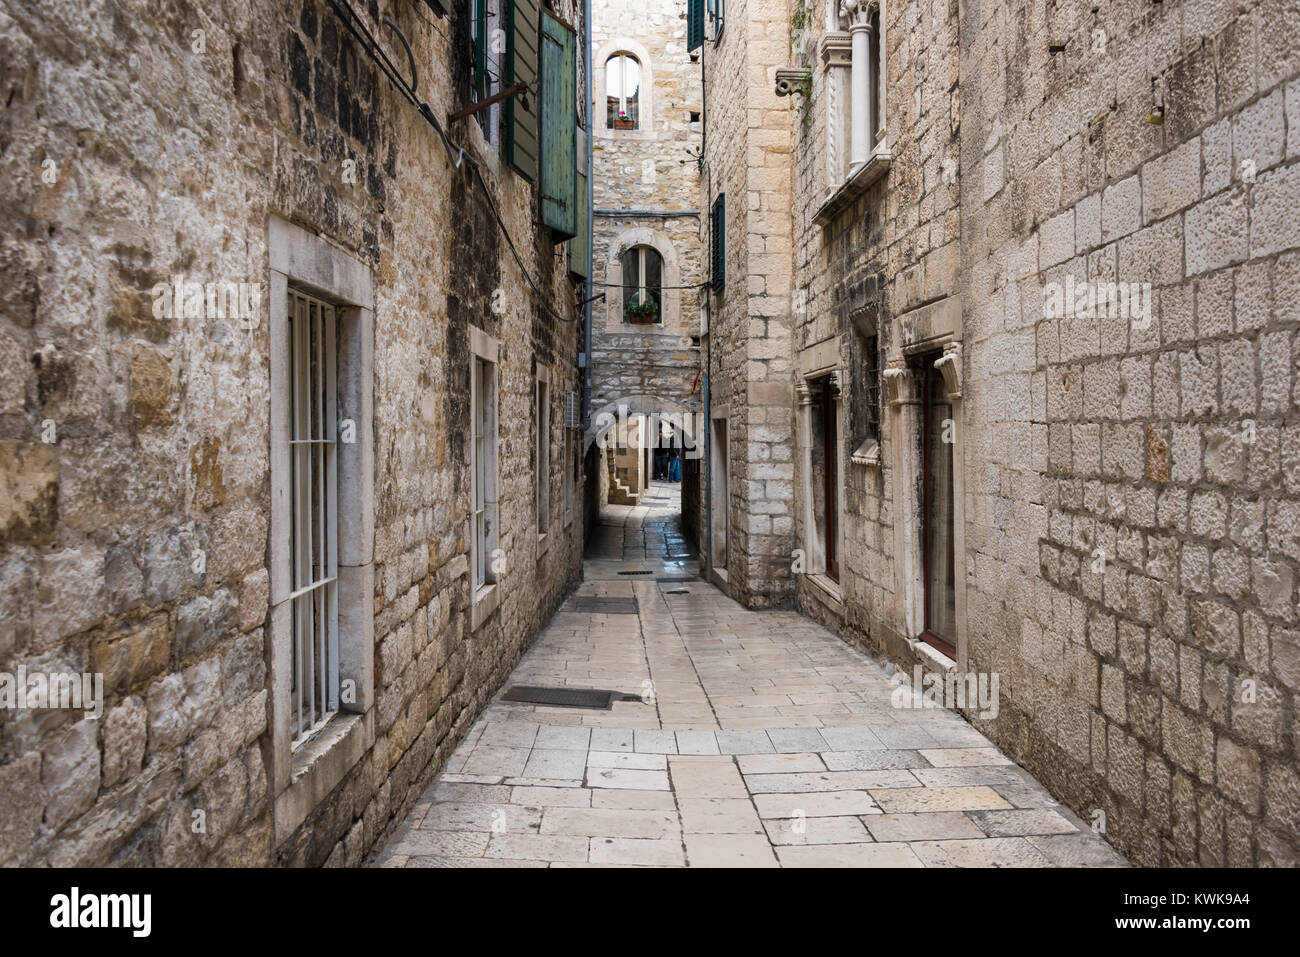 Papaliceva Street, Game of Thrones location, Split, Croatia - Stock Image